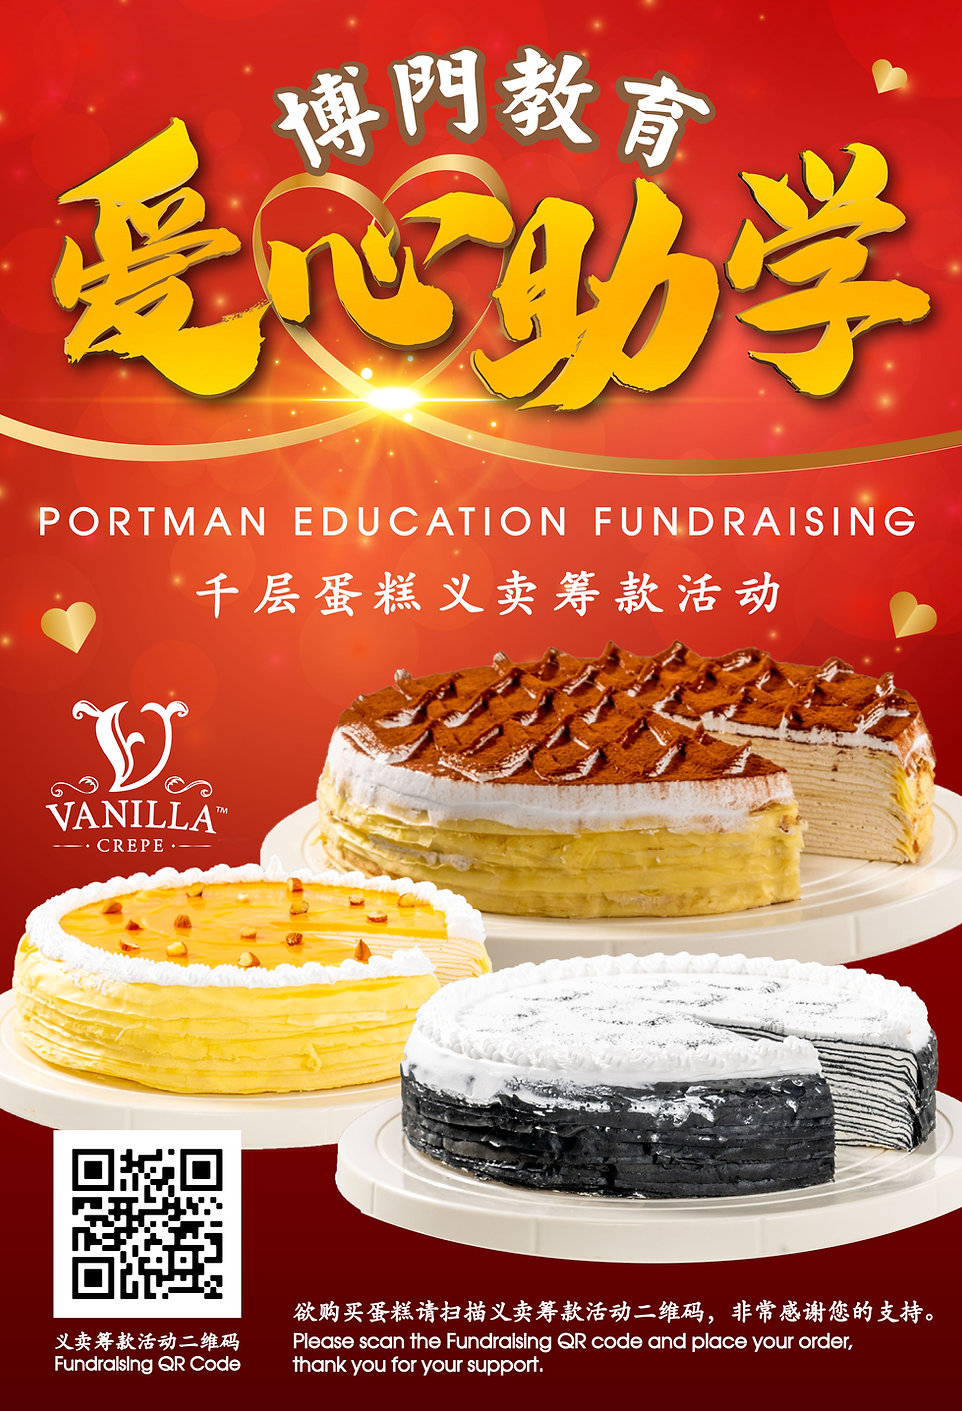 PC_Vanilla Crepe Fundraising_VPoster_202